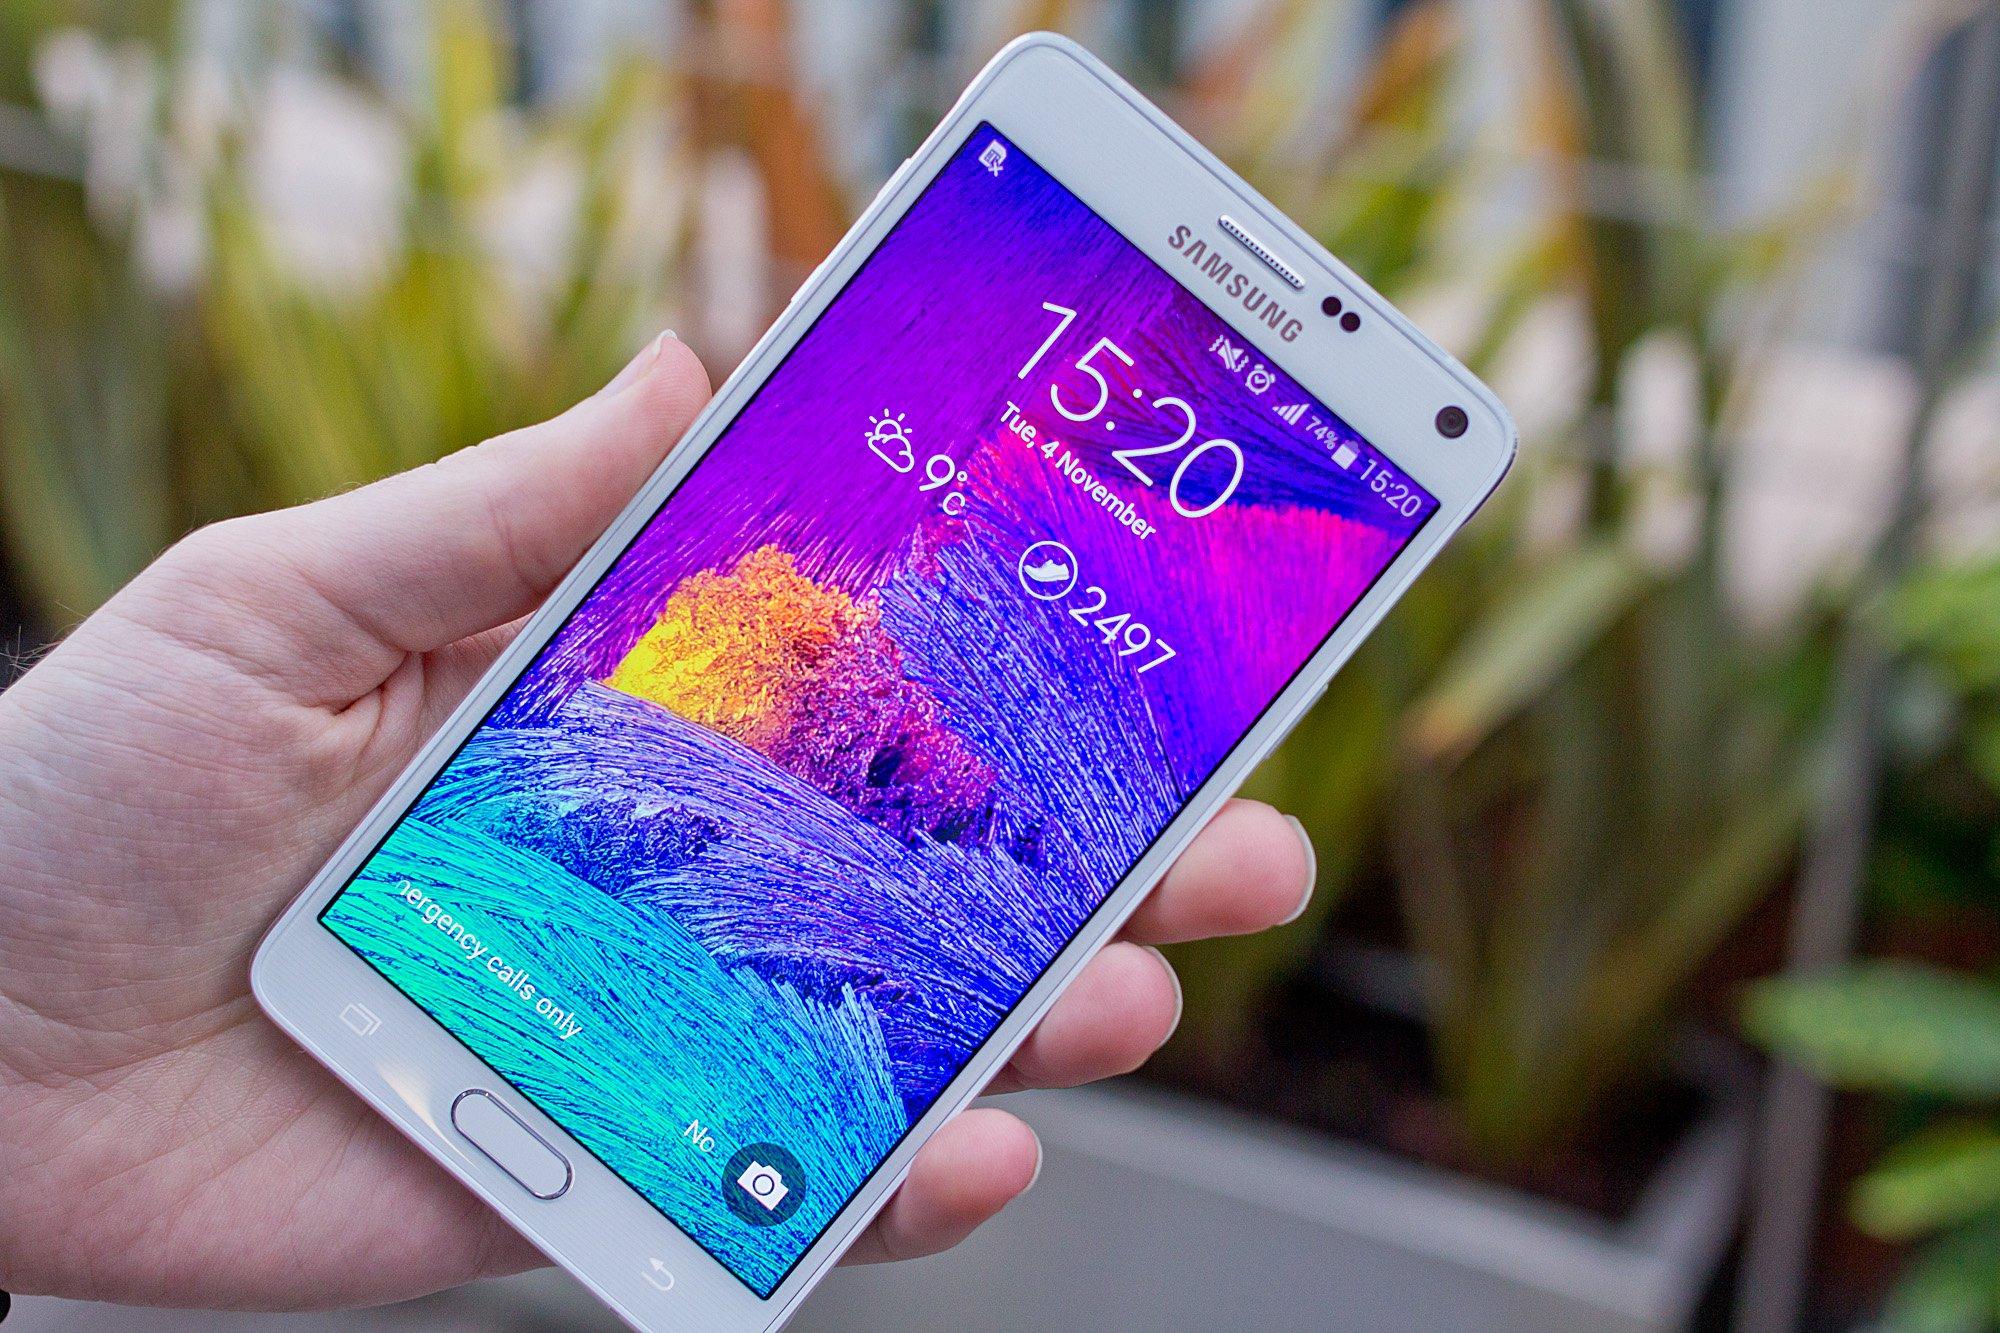 Samsung_Galaxy_Note_4_MG_6879